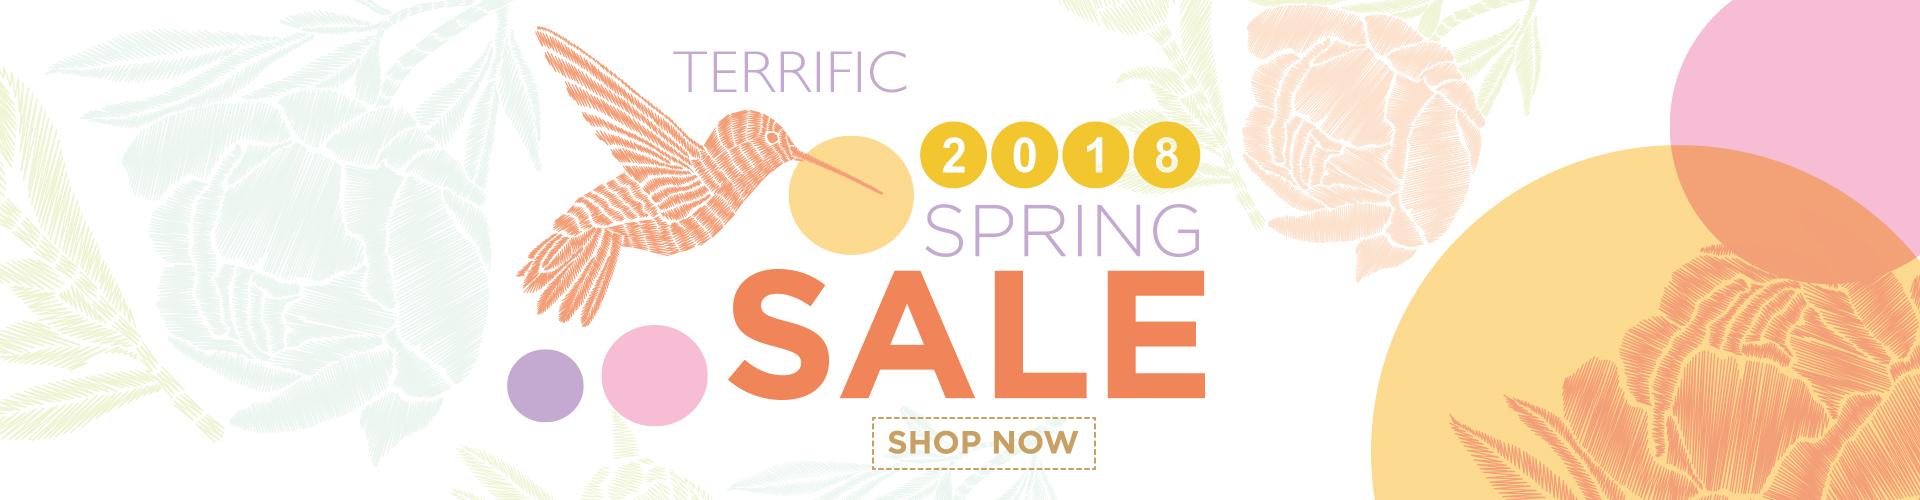 Terrific Promotional Merchandise 2018 Spring Sale